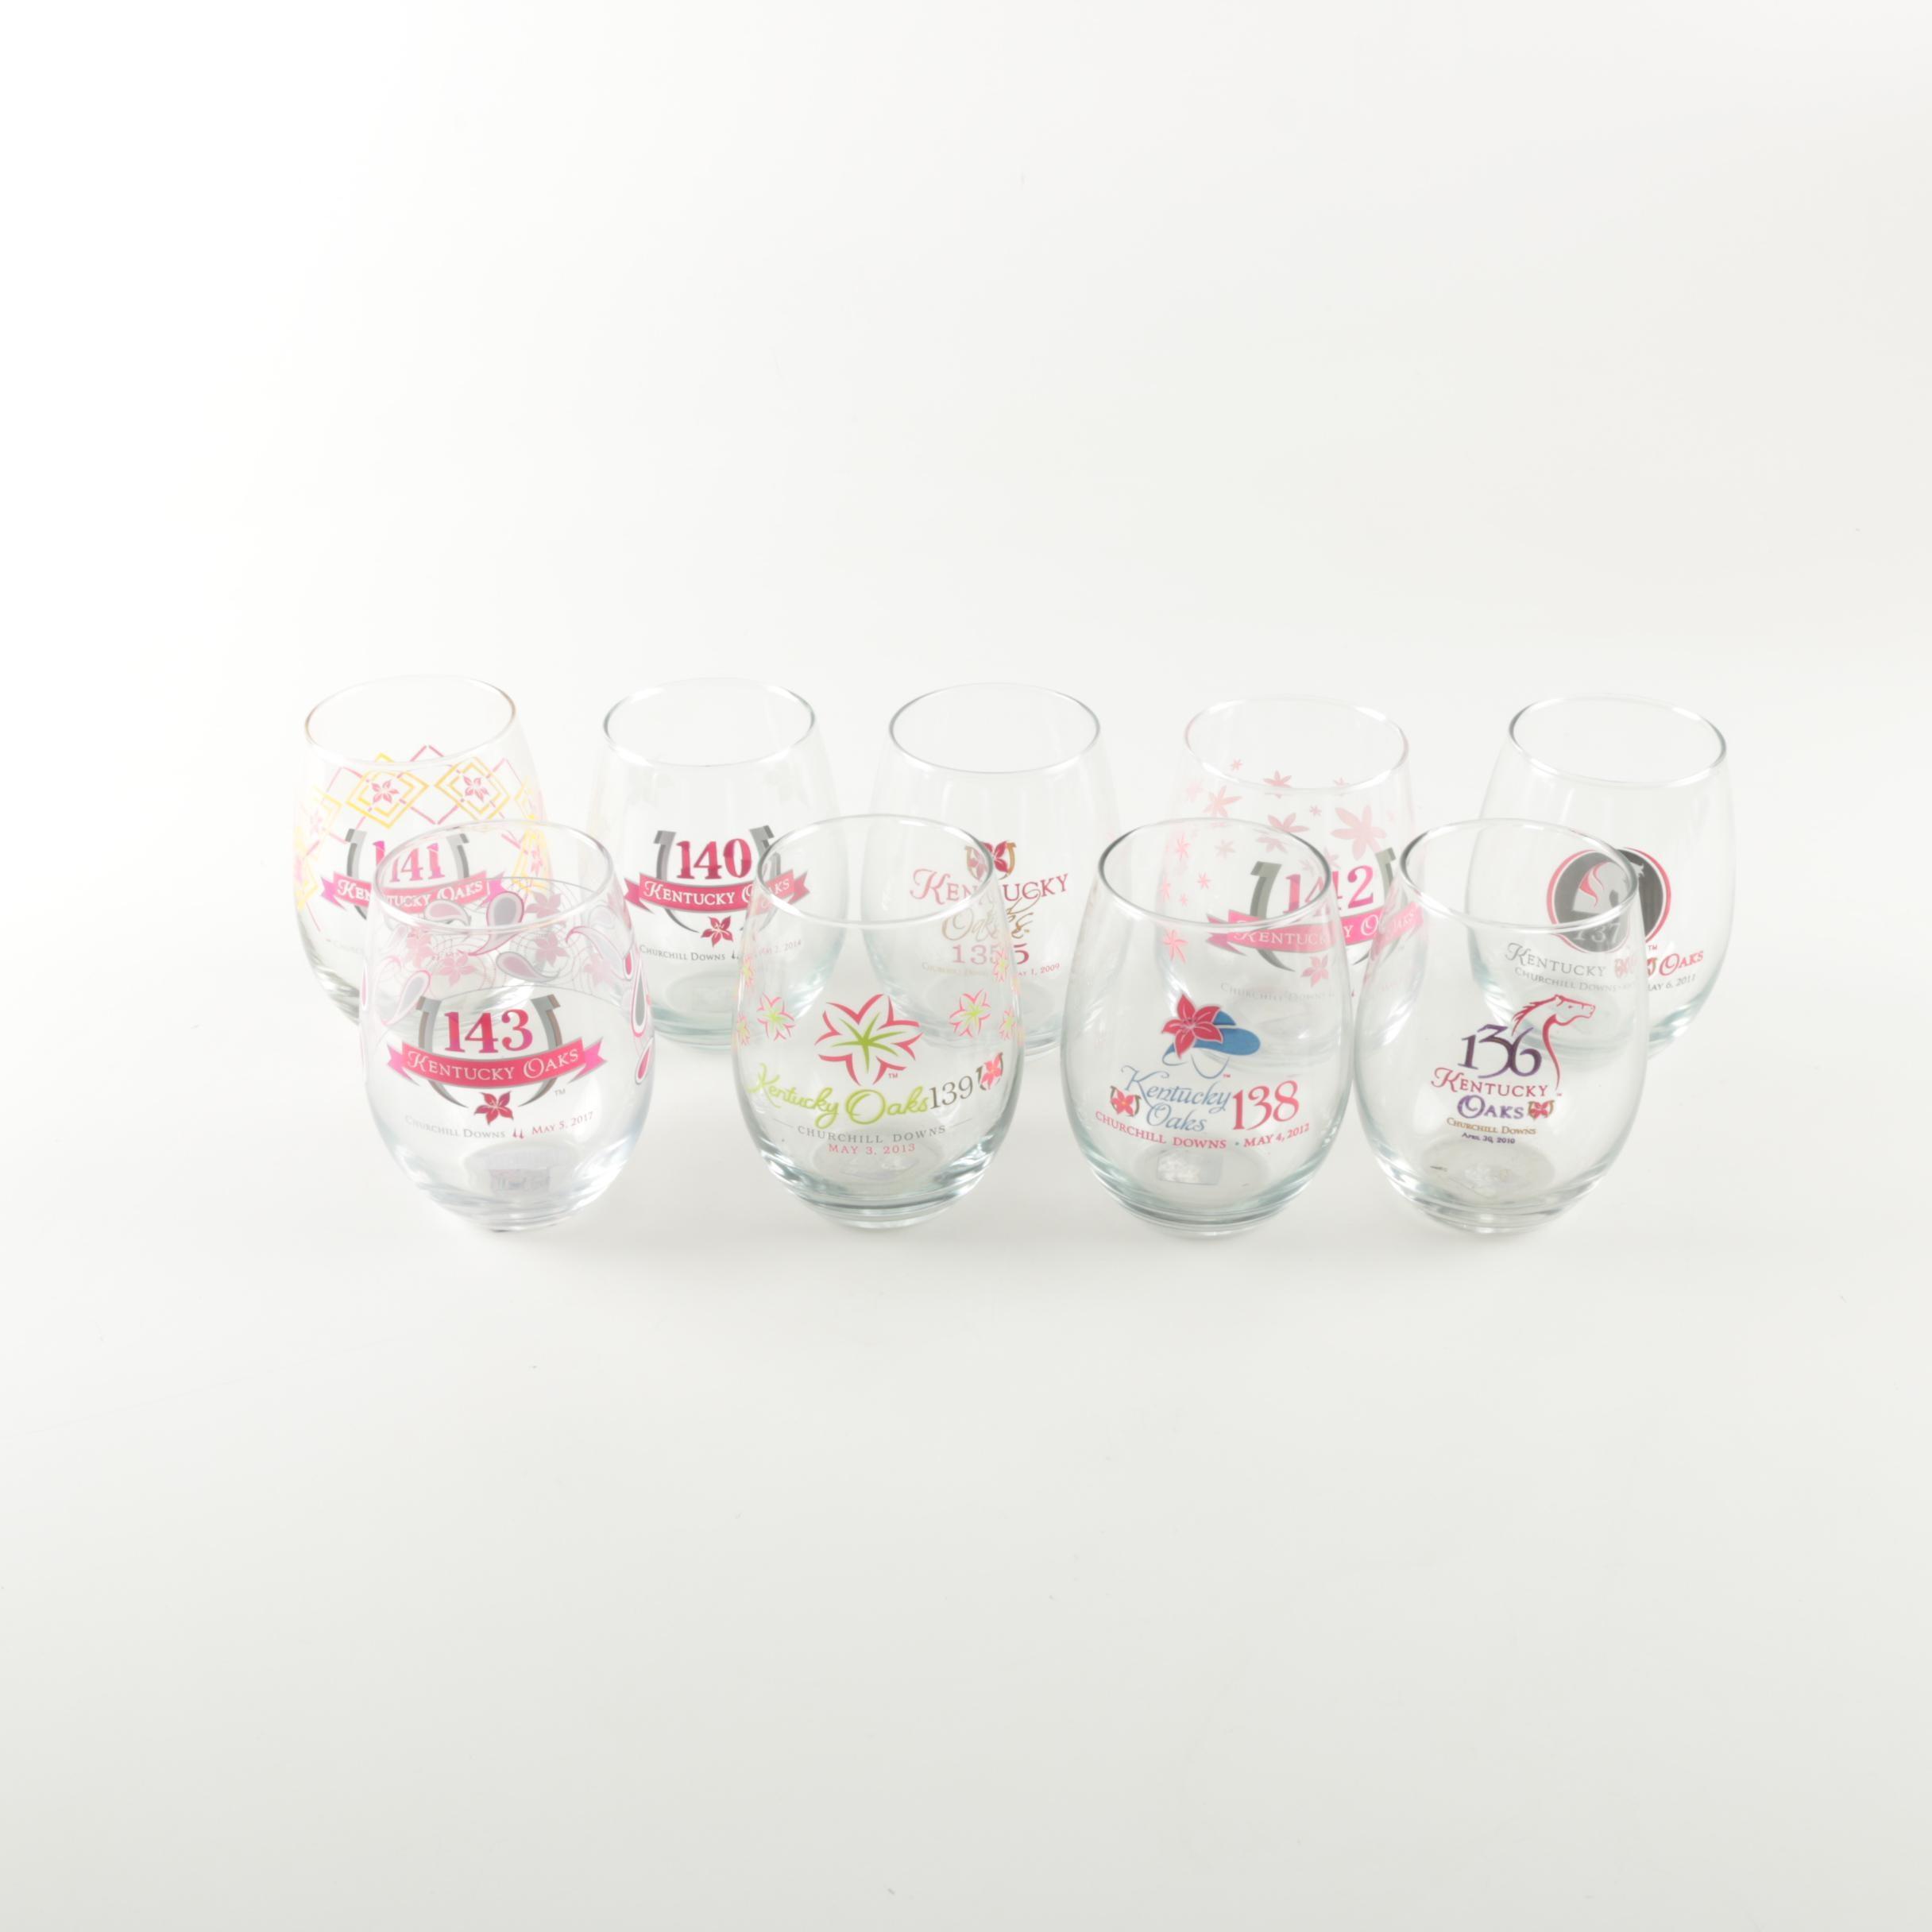 Commemorative Kentucky Oaks Tumbler Glasses